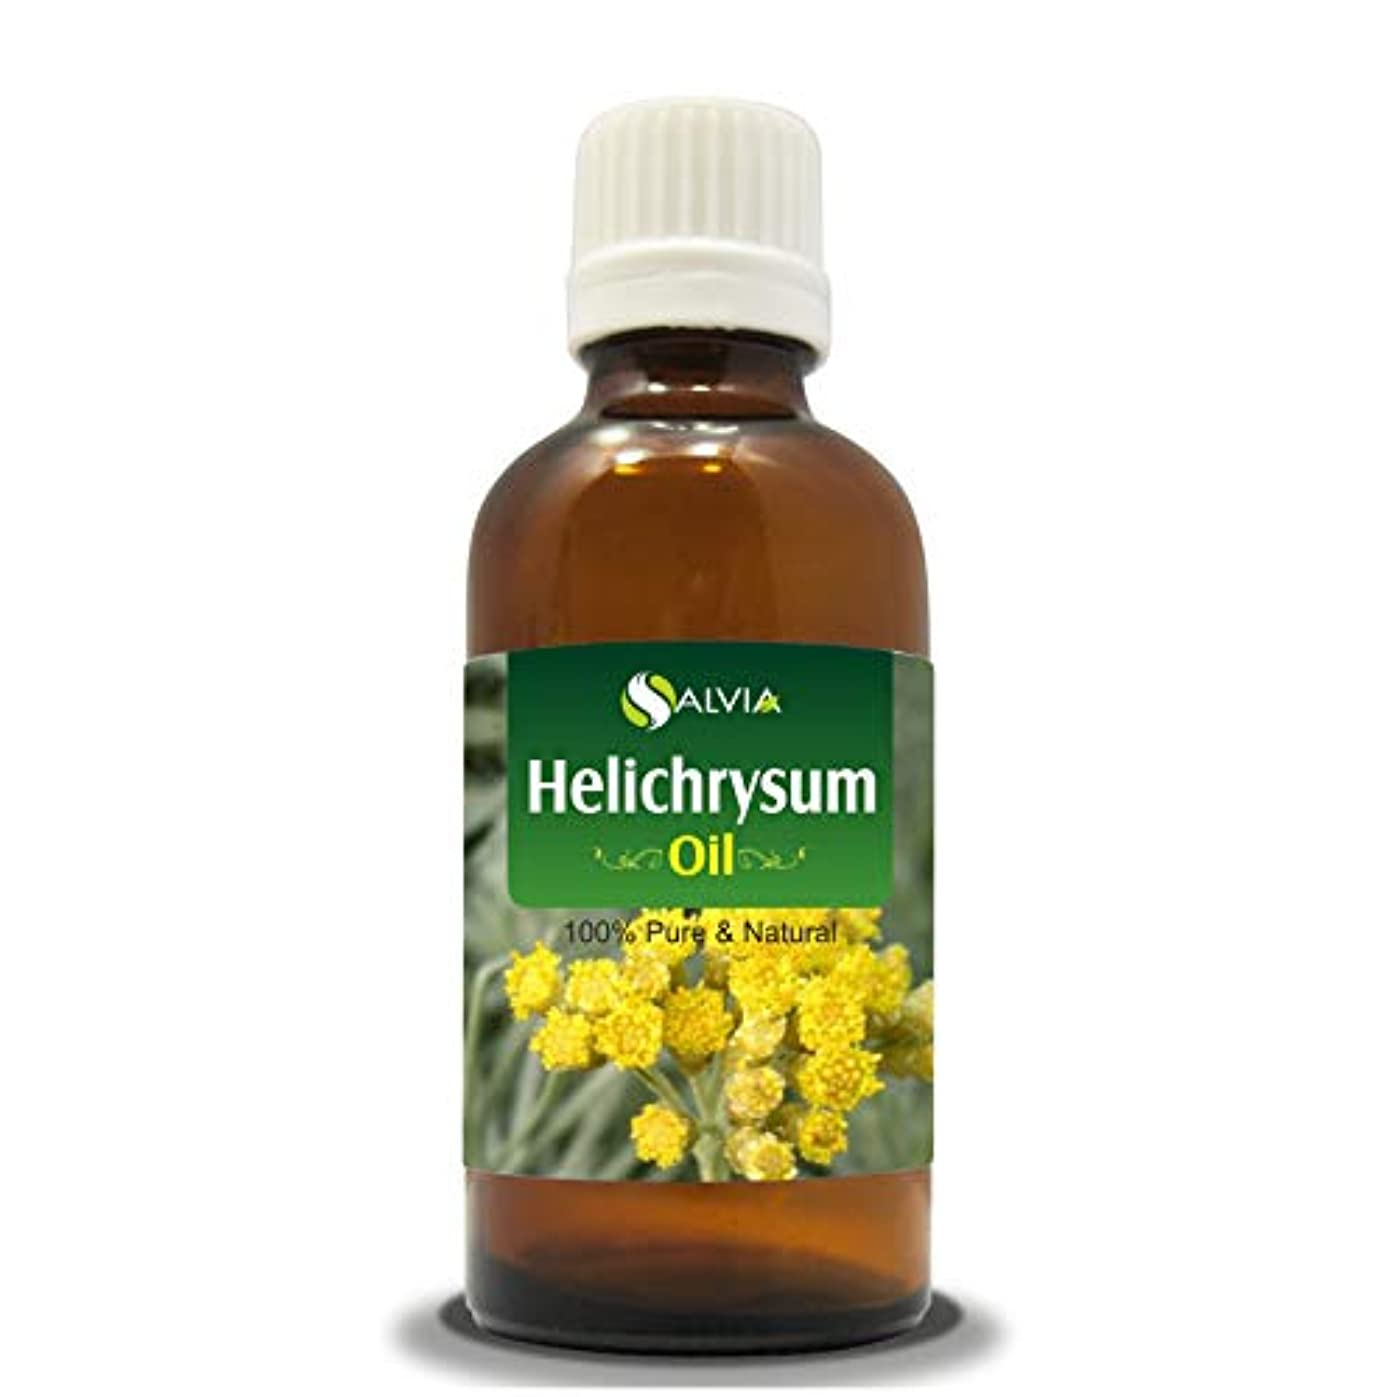 HELICHRYSUM OIL (HELICHRYSUM ITALICUM) 100% NATURAL PURE ESSENTIAL OIL 50ML